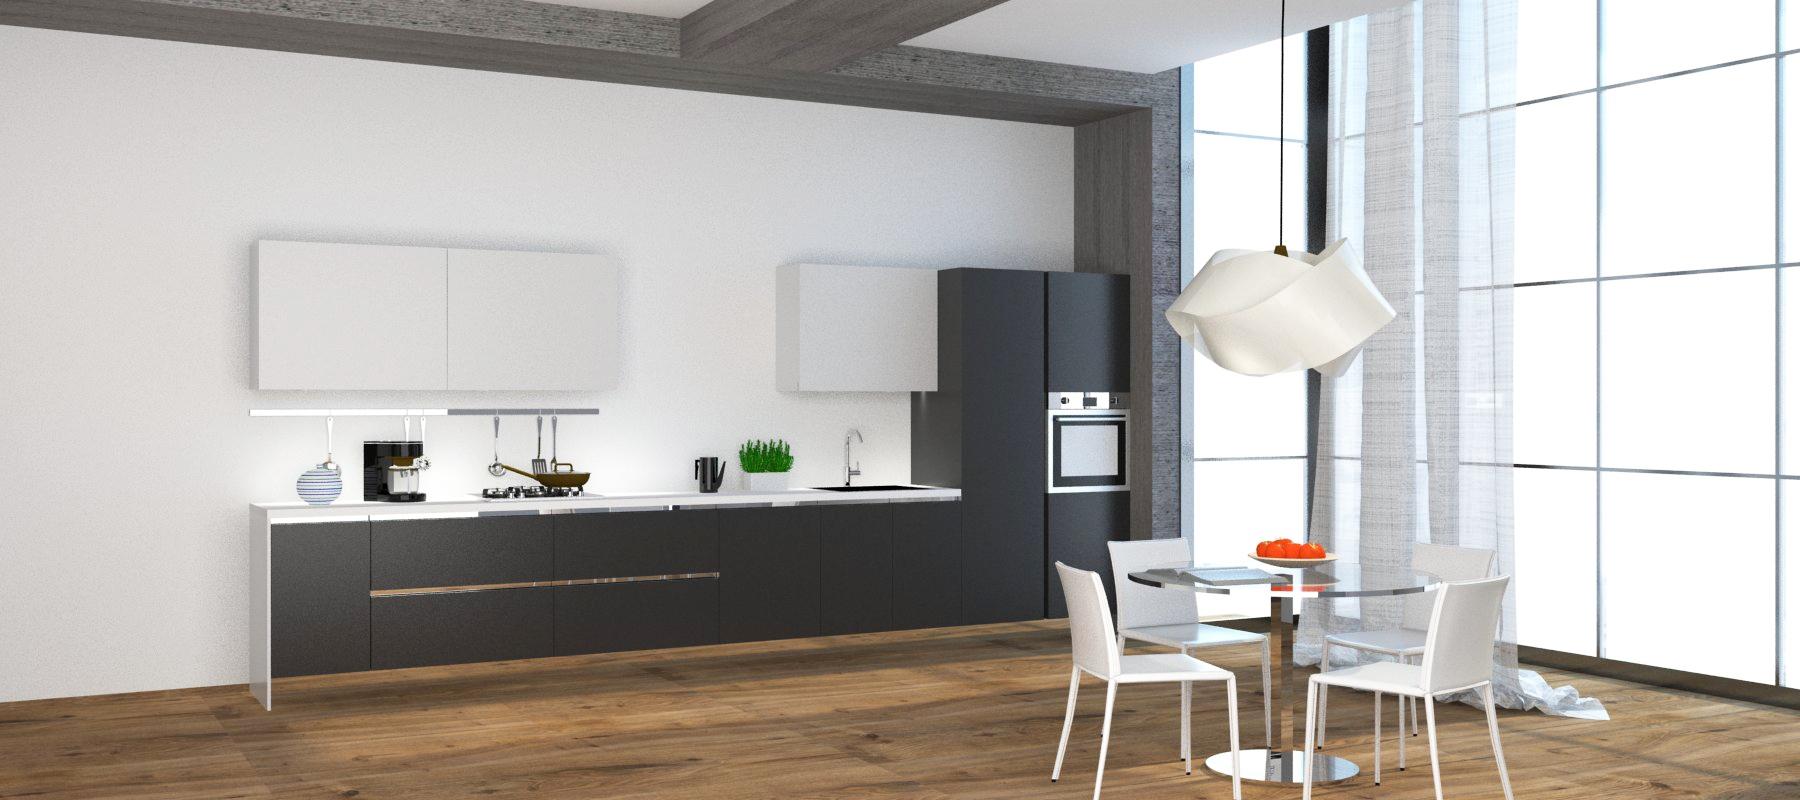 Stunning costo cucina in muratura ideas acrylicgiftware for Costo cucina